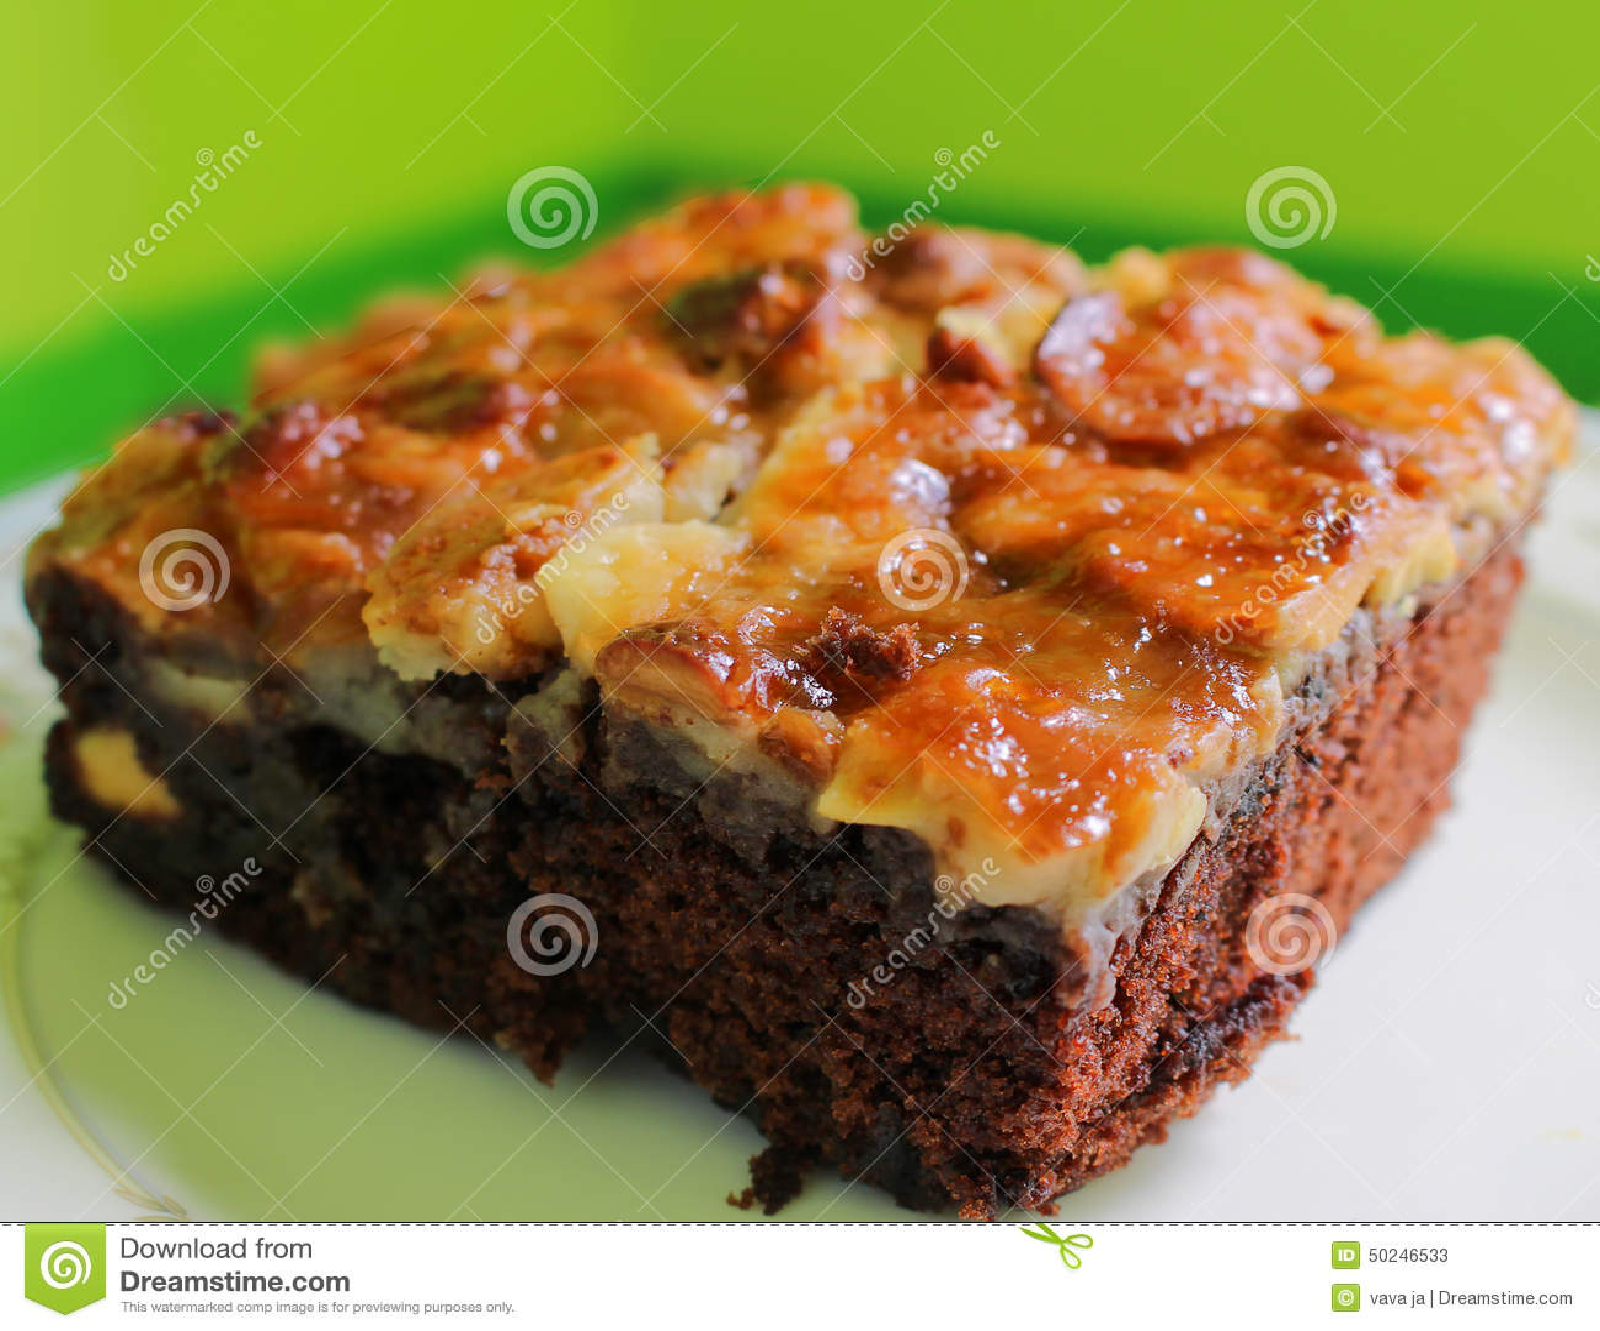 Closeup Baked Brownie Stock Photo - Image: 50246533